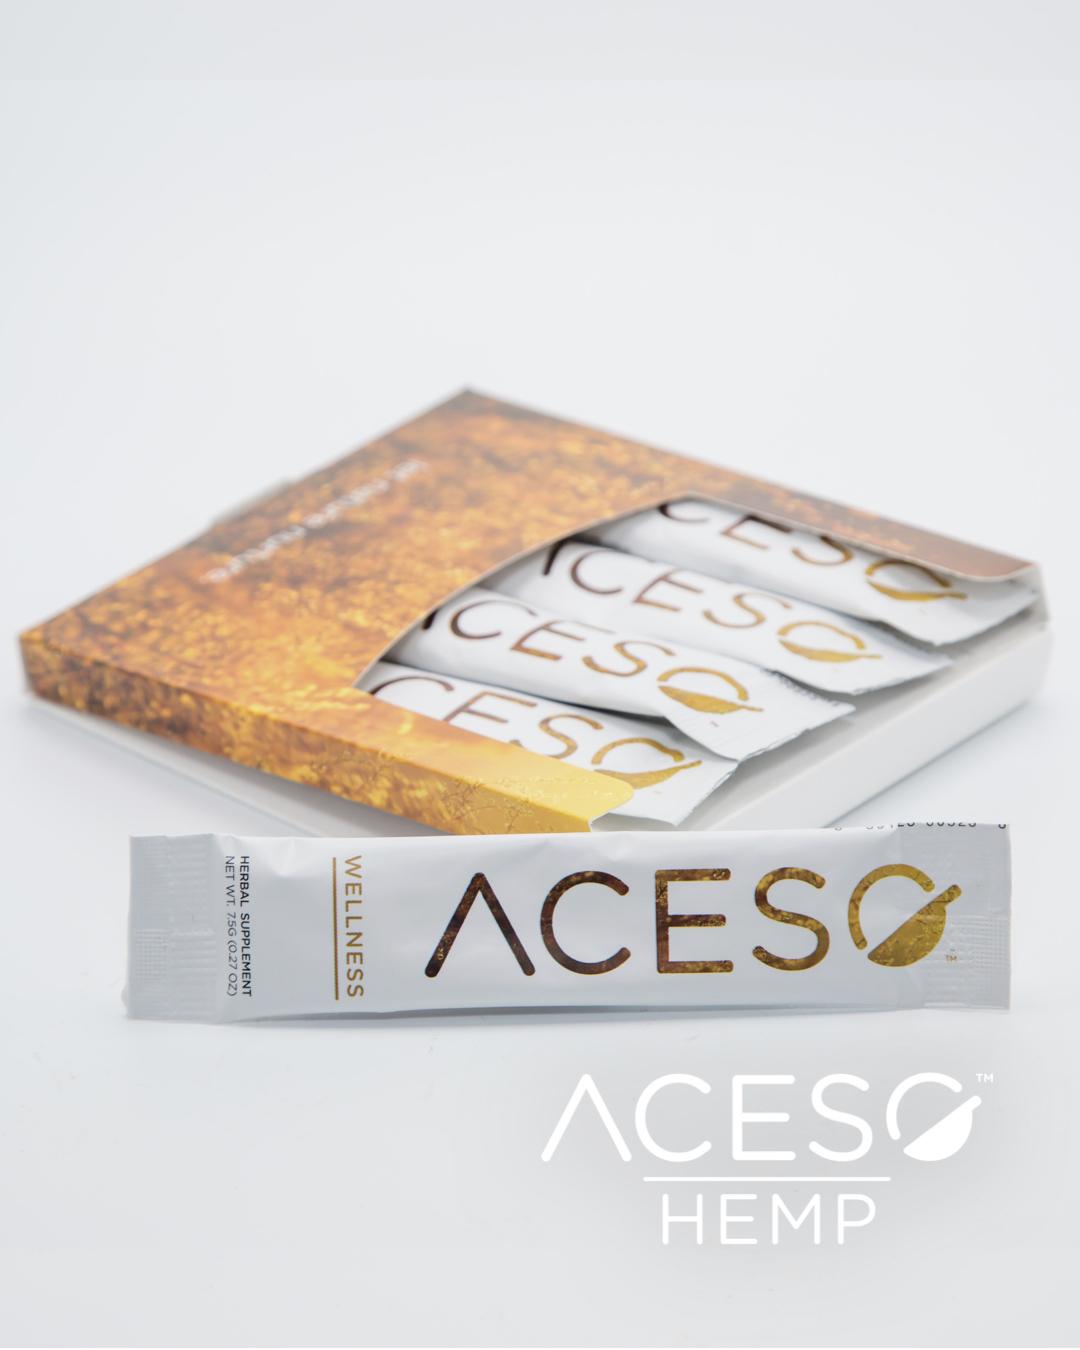 ACESCO CDS EAST 2019.001.jpeg